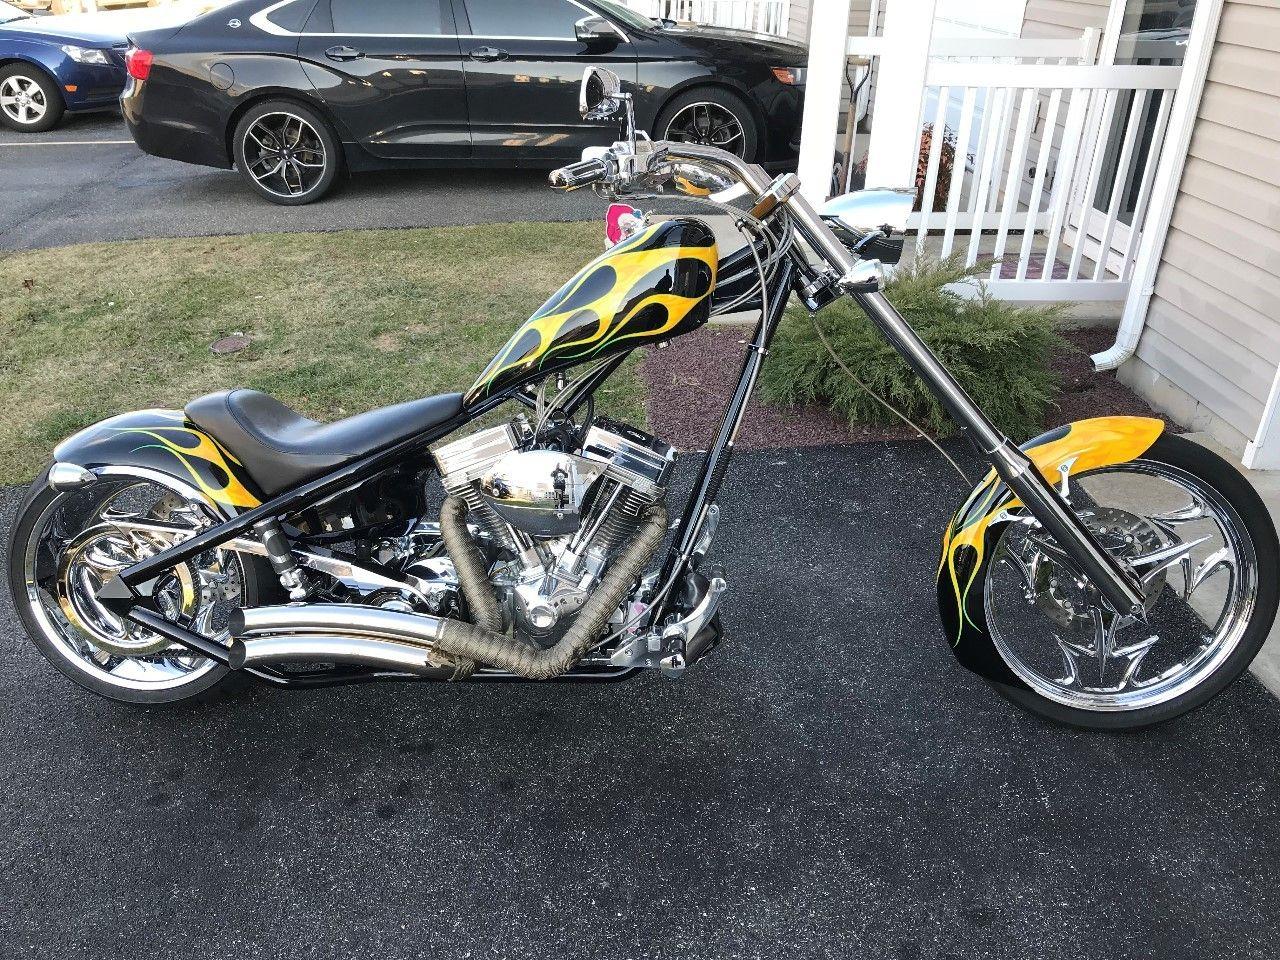 2005 Big Dog Motorcycles RIDGEBACK Big dog motorcycle